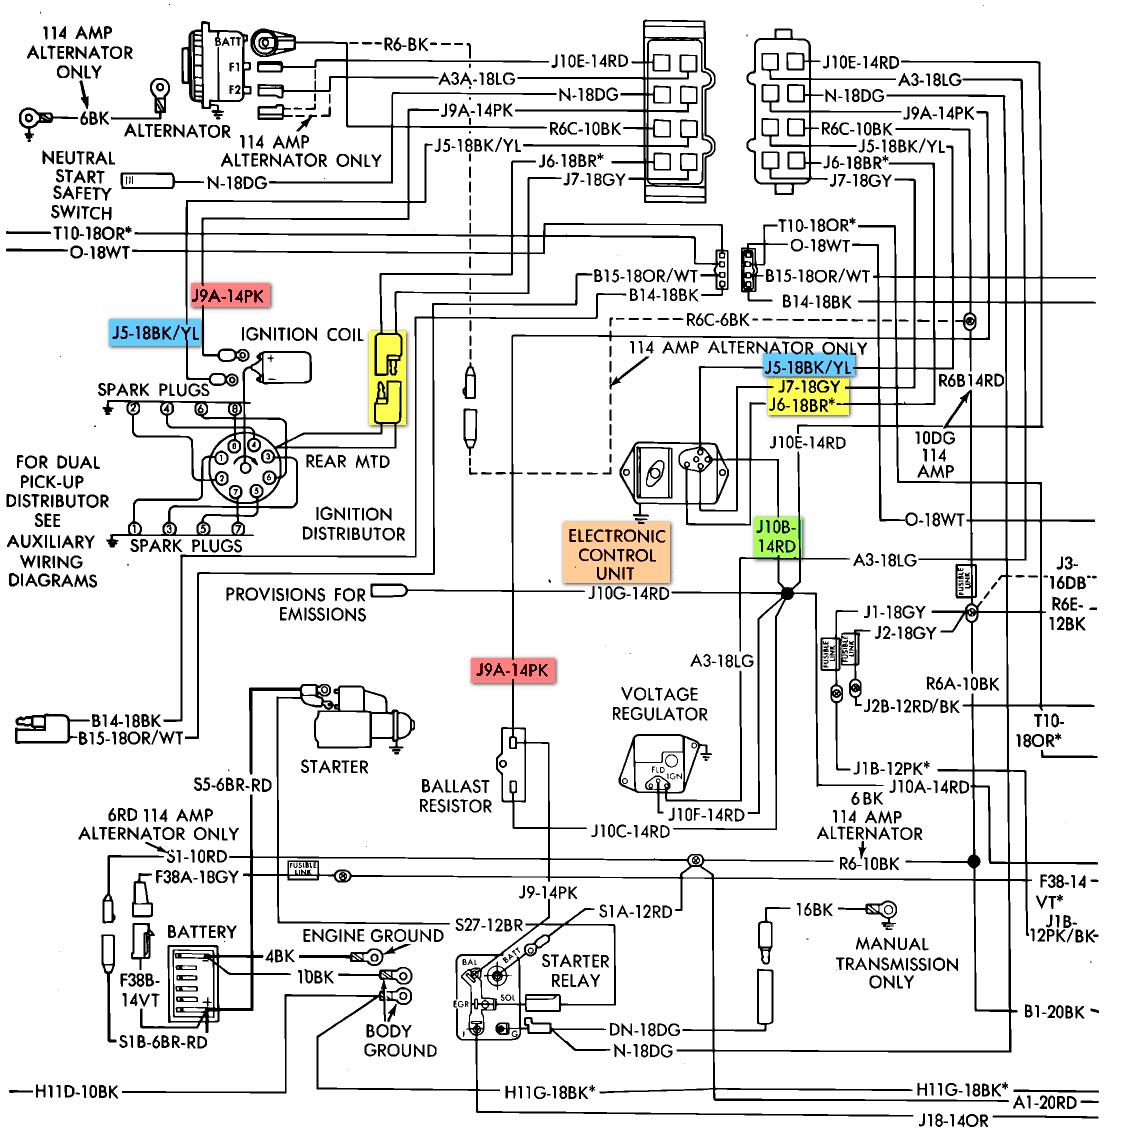 Diagram 1977 Dodge Motorhome Wiring Diagram Full Version Hd Quality Wiring Diagram Koehlerelectricmn Blidetoine Fr